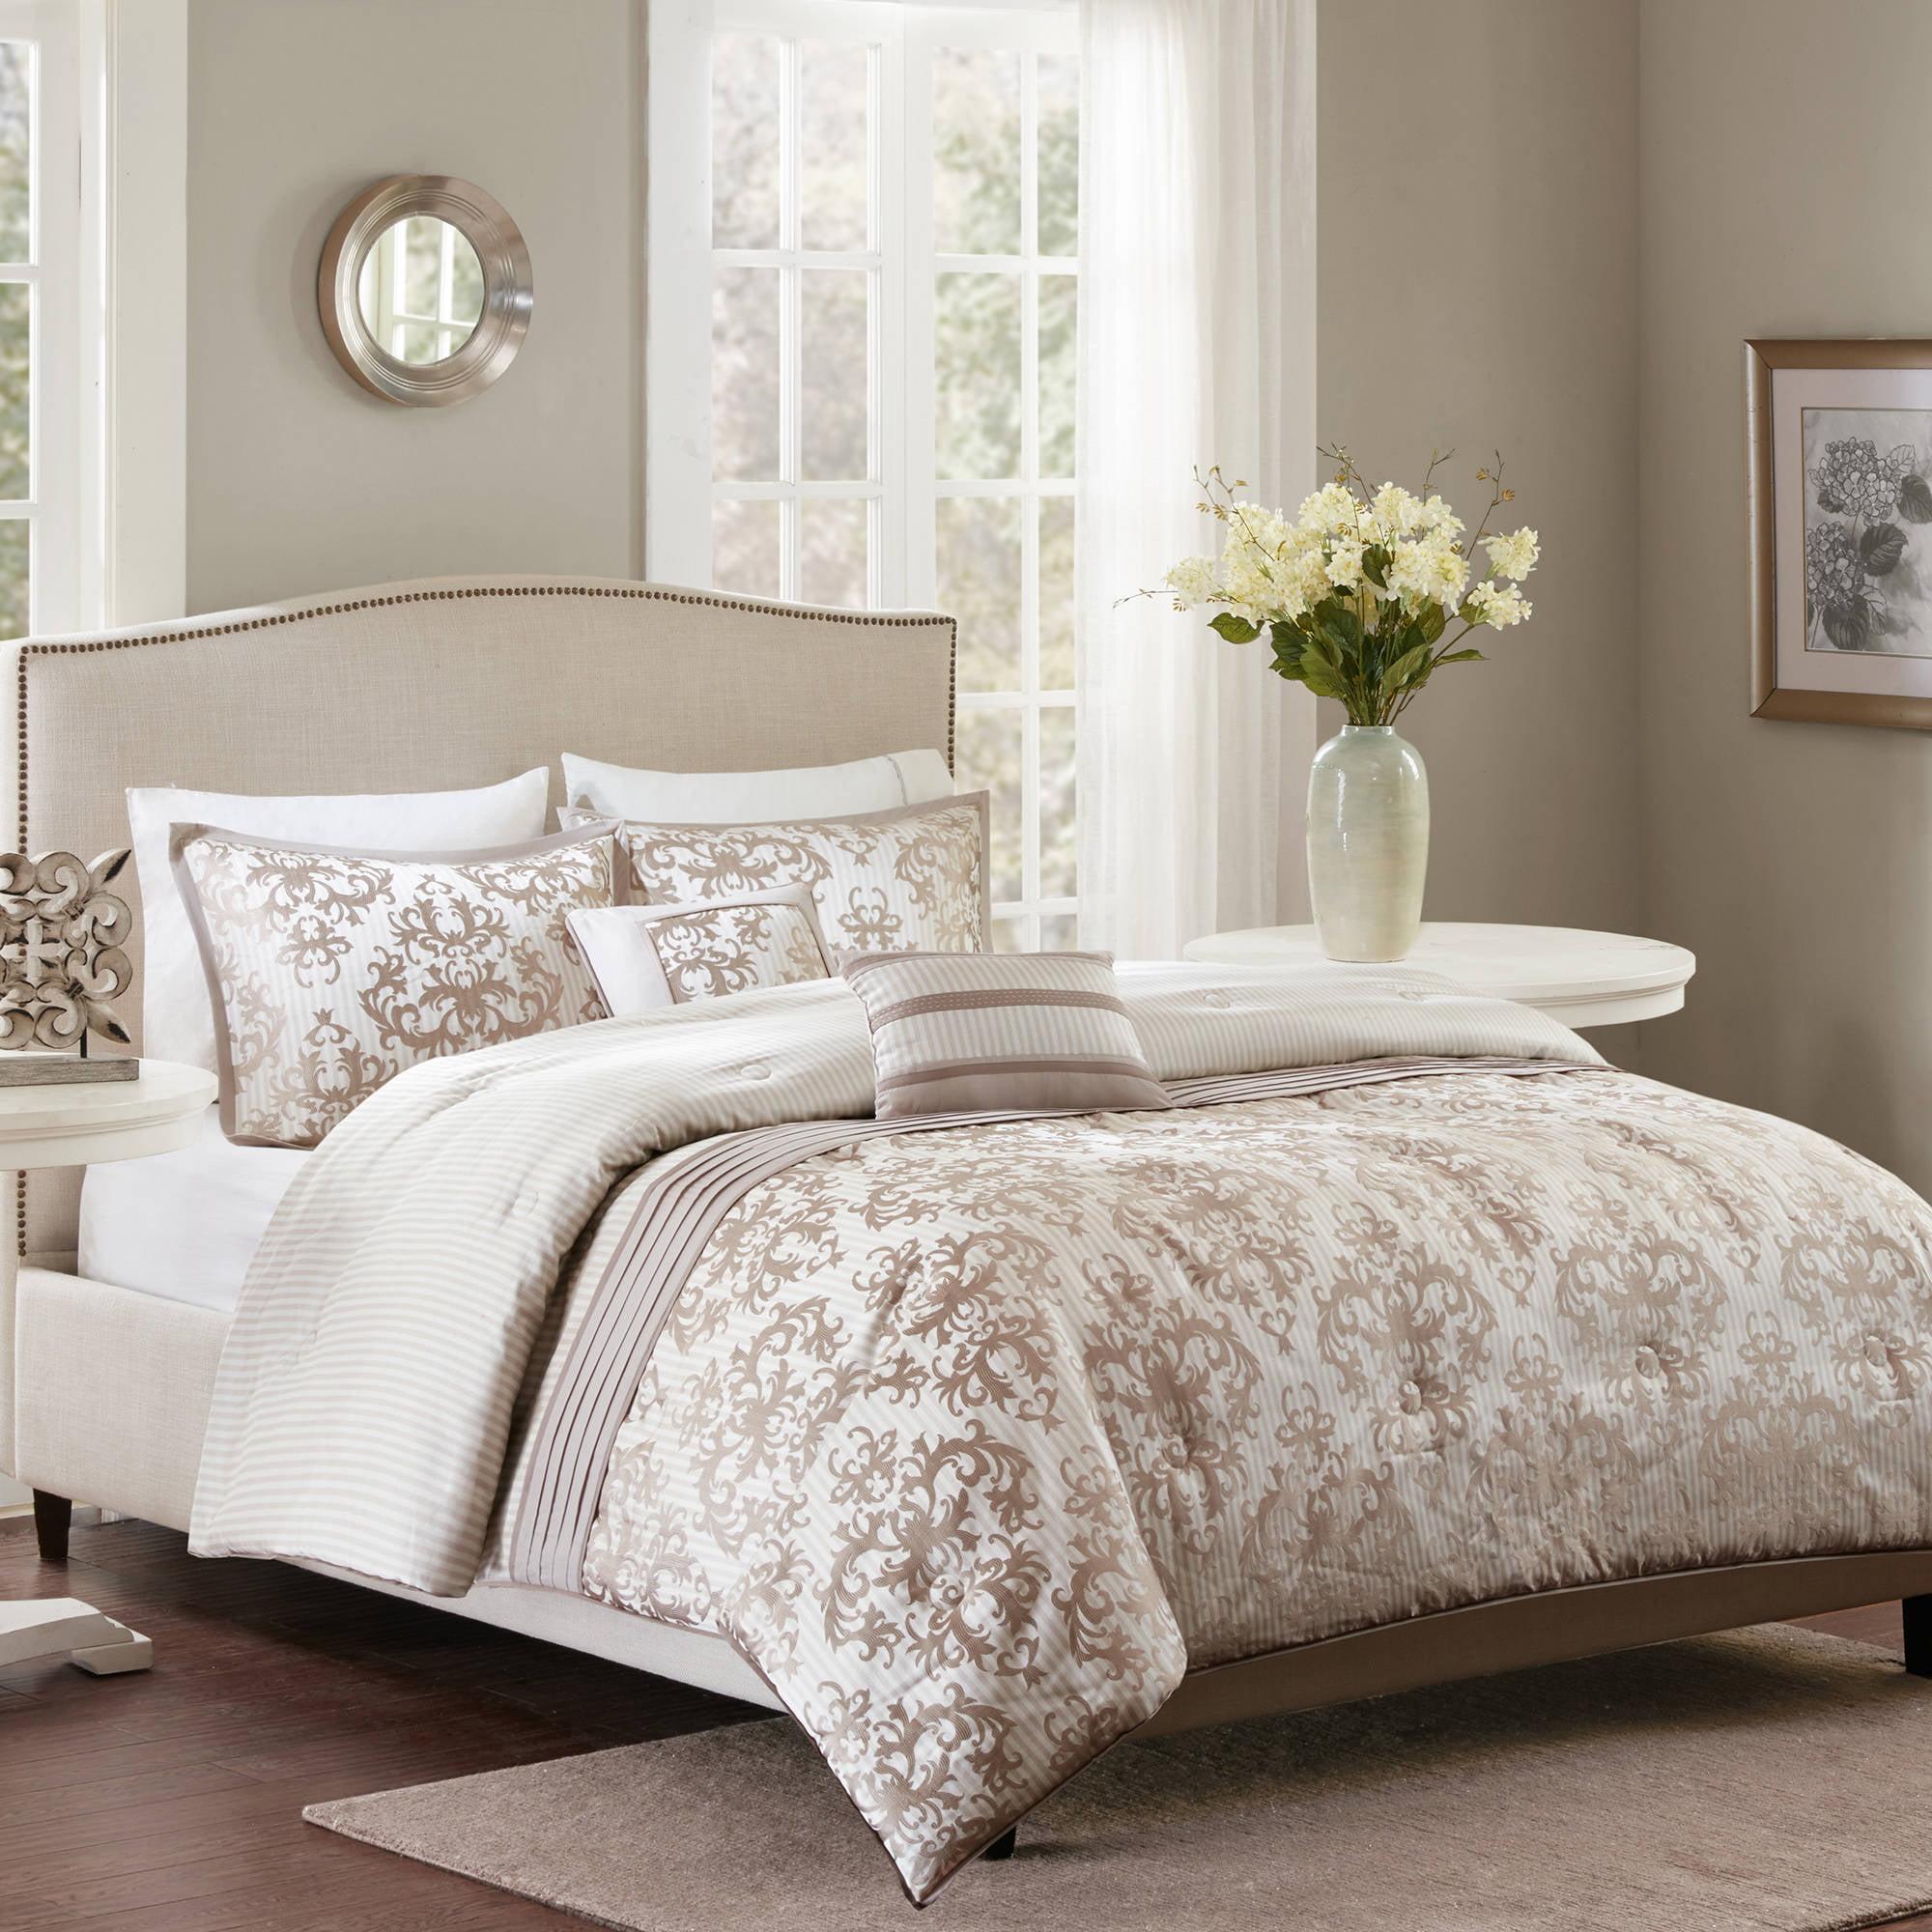 Leona Seven Piece Bedding Set Bedding Sets